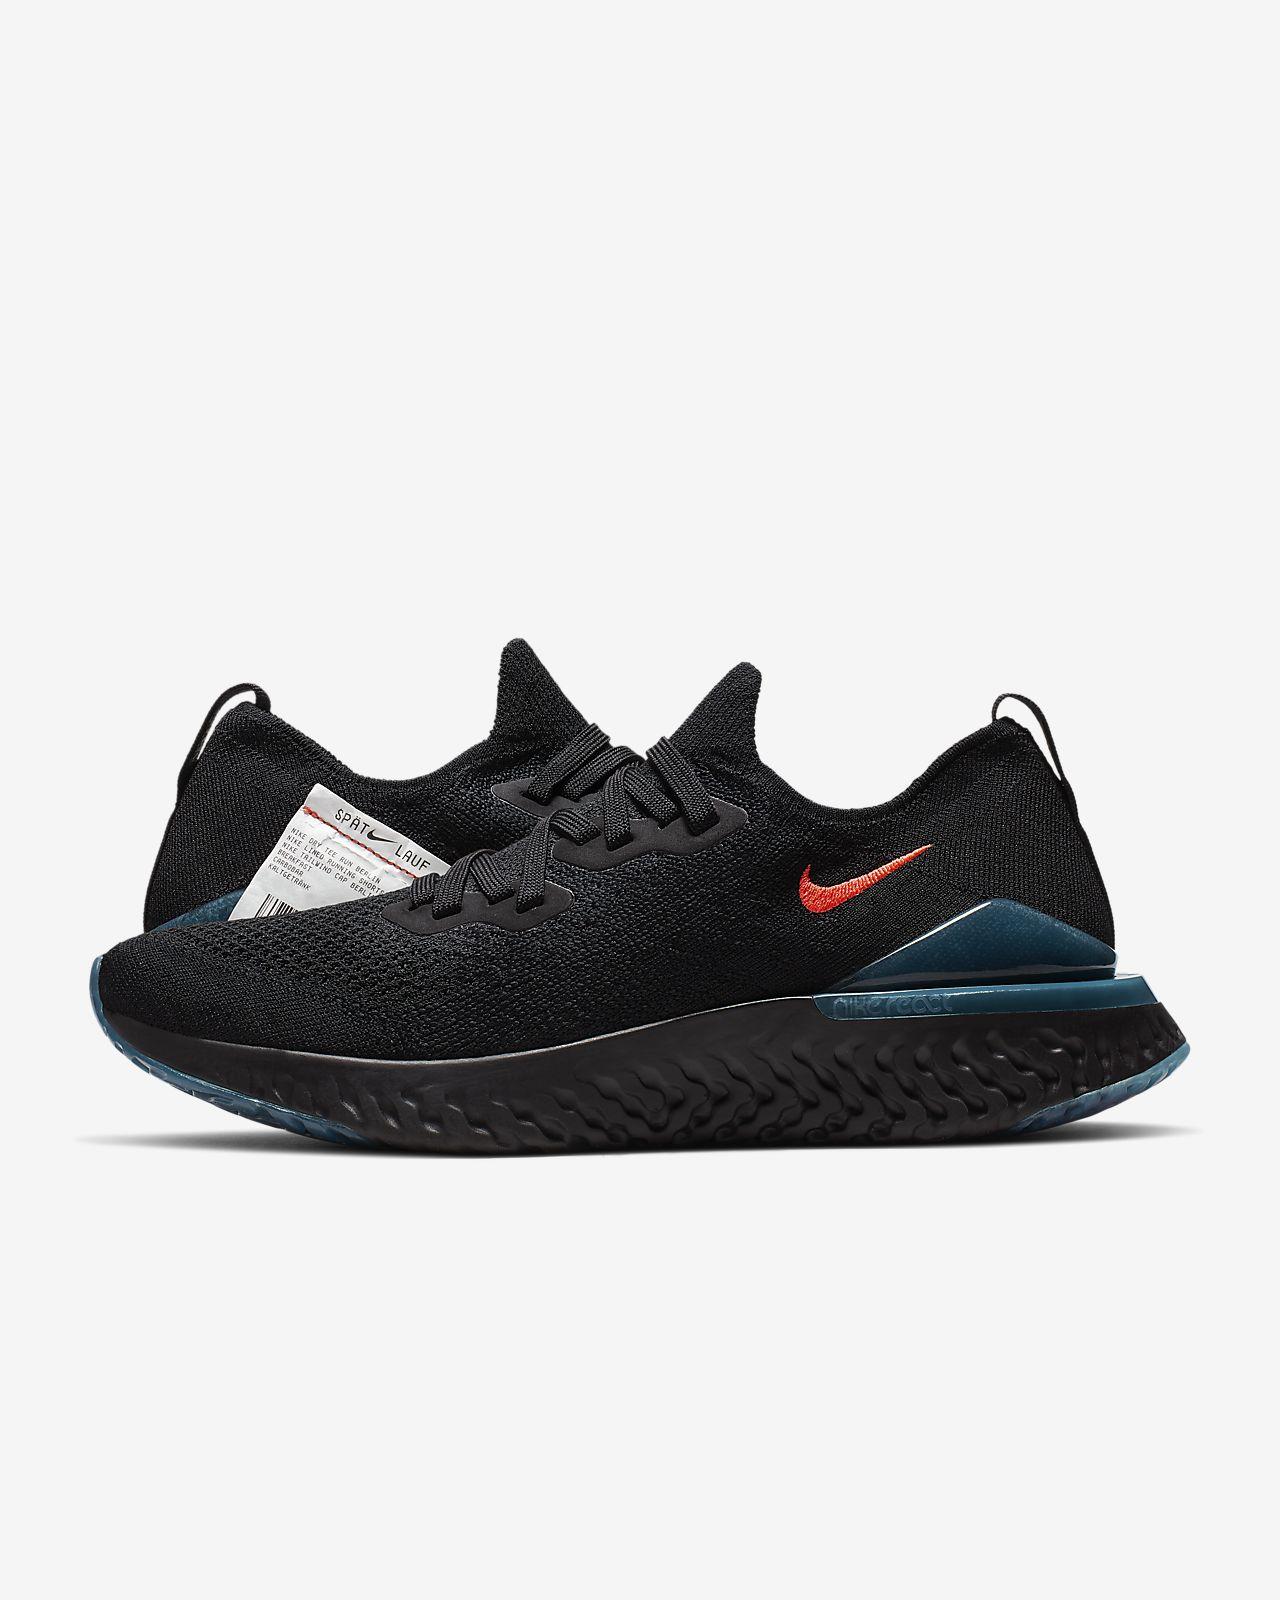 best sneakers 63bfe f0381 ... Löparsko Nike Epic React FK 2 Späti för män